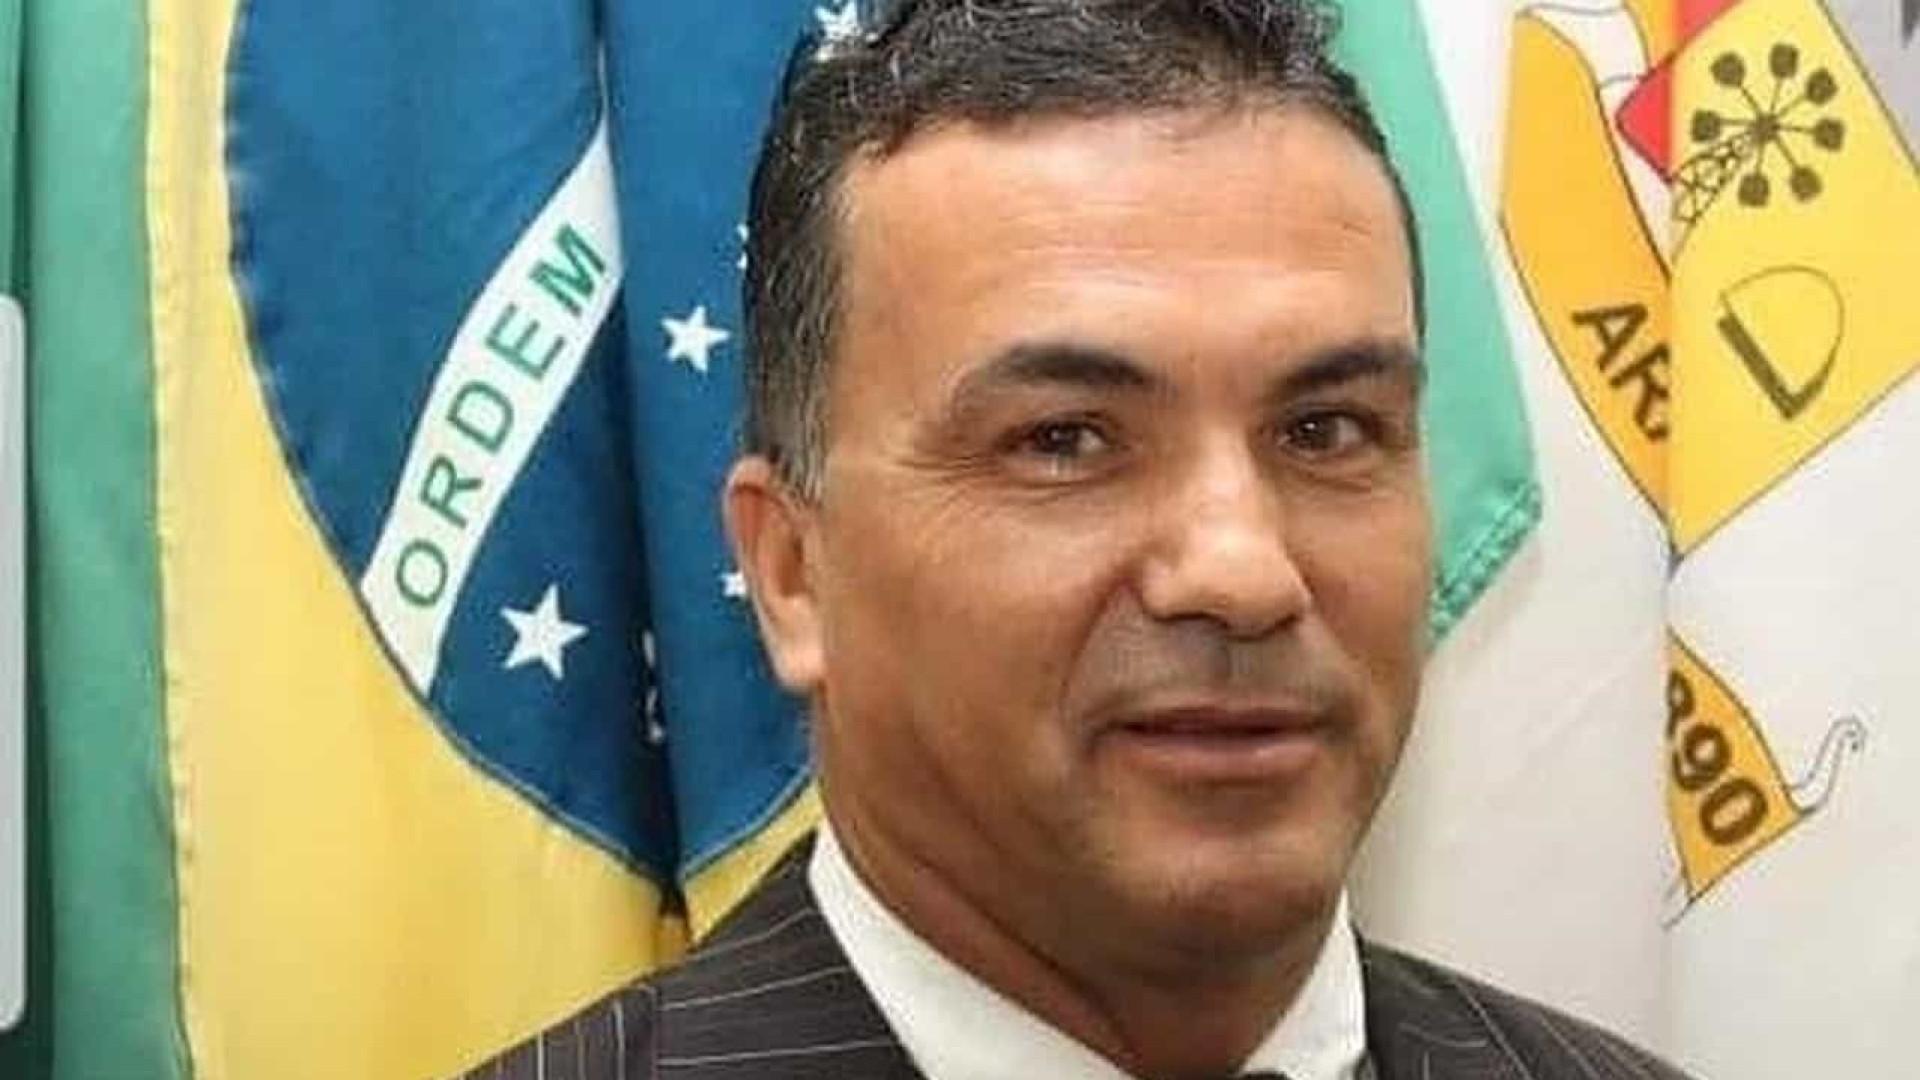 Vereador de Araruama, no Rio de Janeiro, é morto a tiros